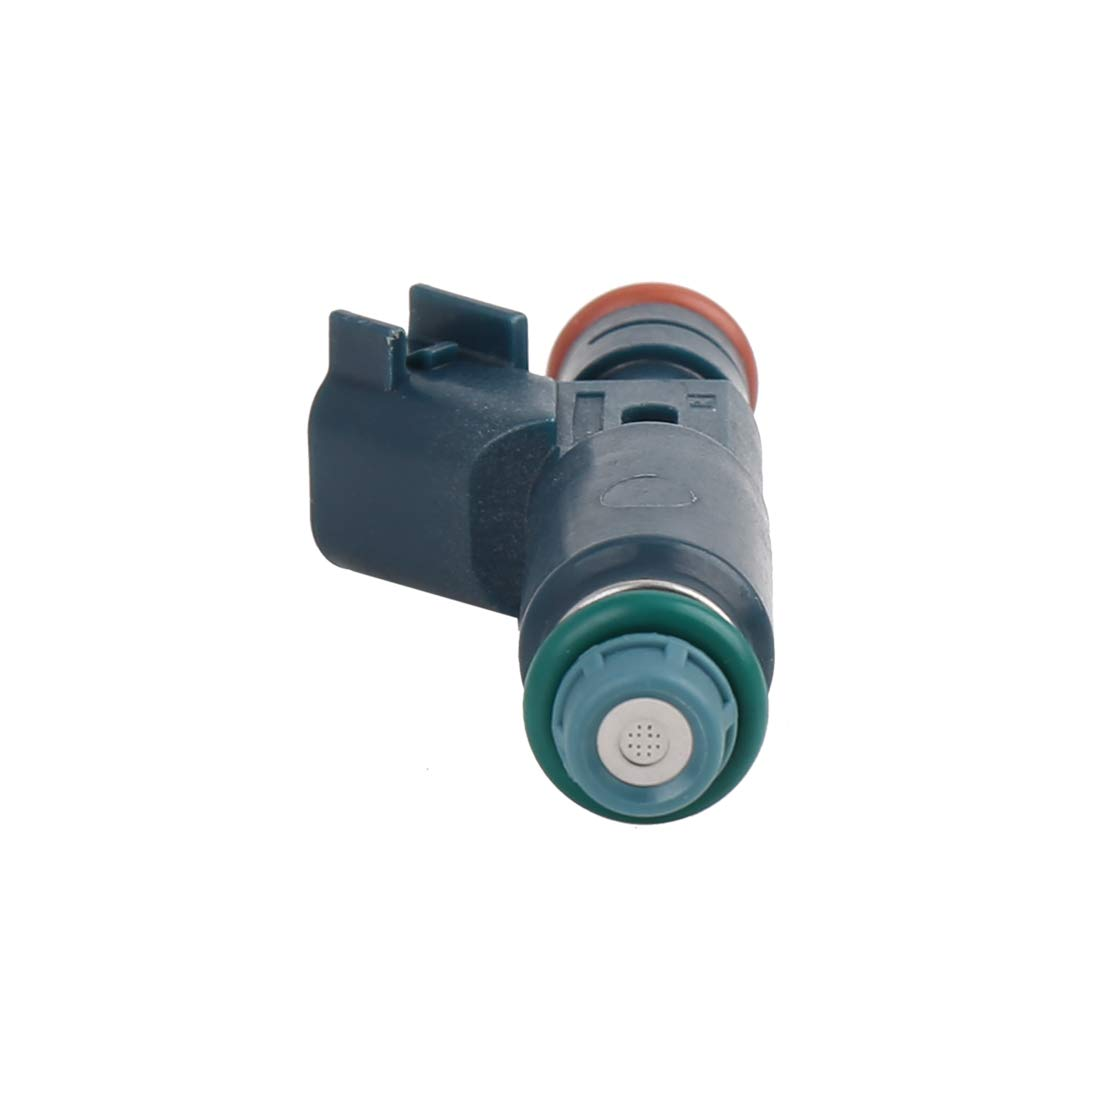 X AUTOHAUX Car Fuel Injector VP4M8G-BA LF62-13-250 DC 12V for 2004-2009 Mazda 3 2.0L 2.3L I4